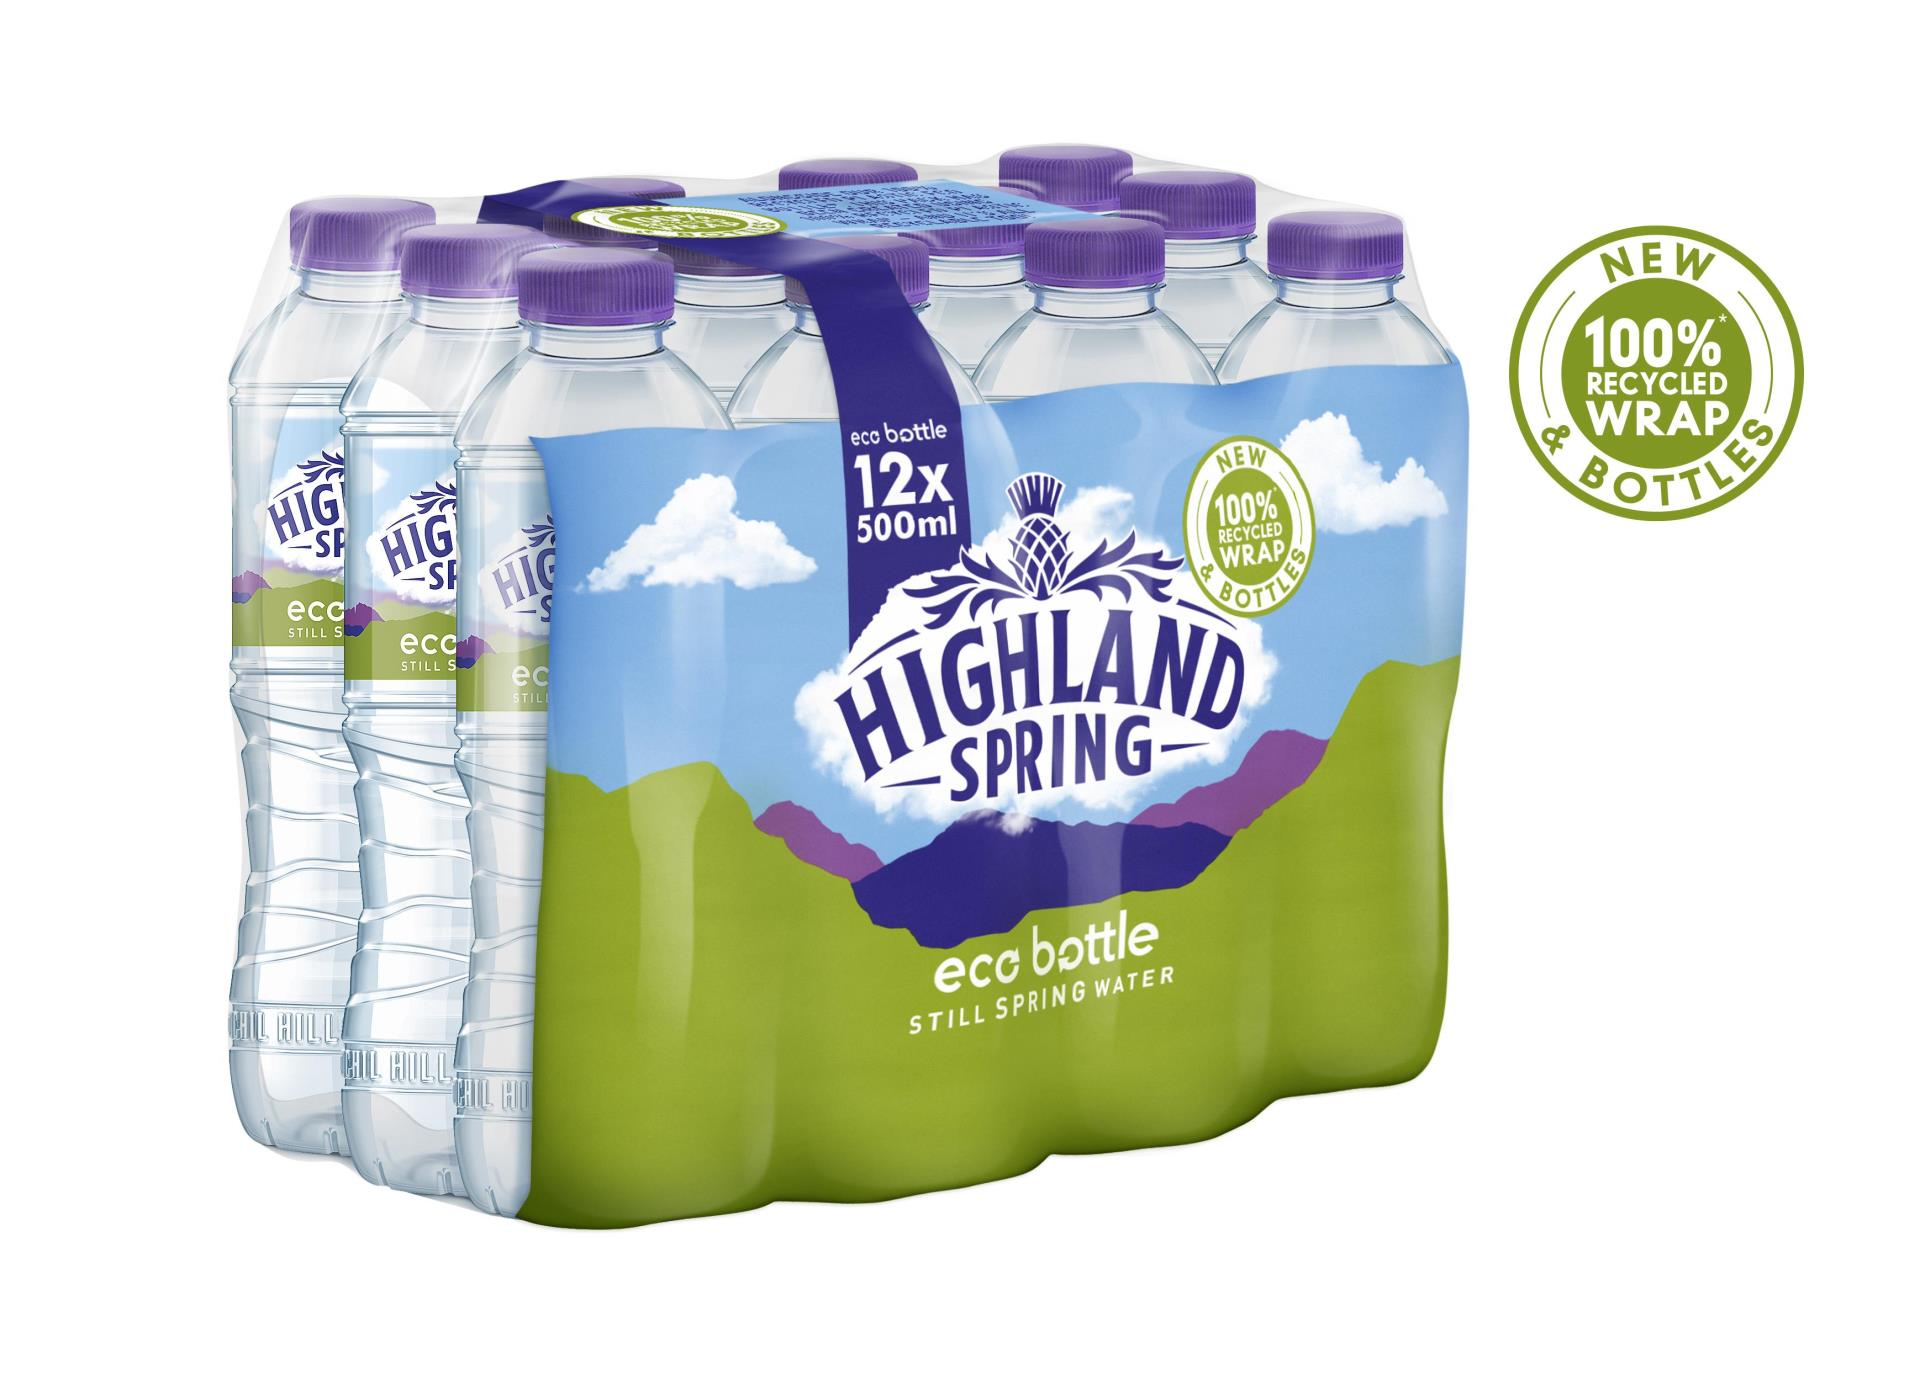 Highland Spring Confirm Closure Of Speyside Glenlivet Bottling Plant Due To 'increasingly Competitive Market' photo